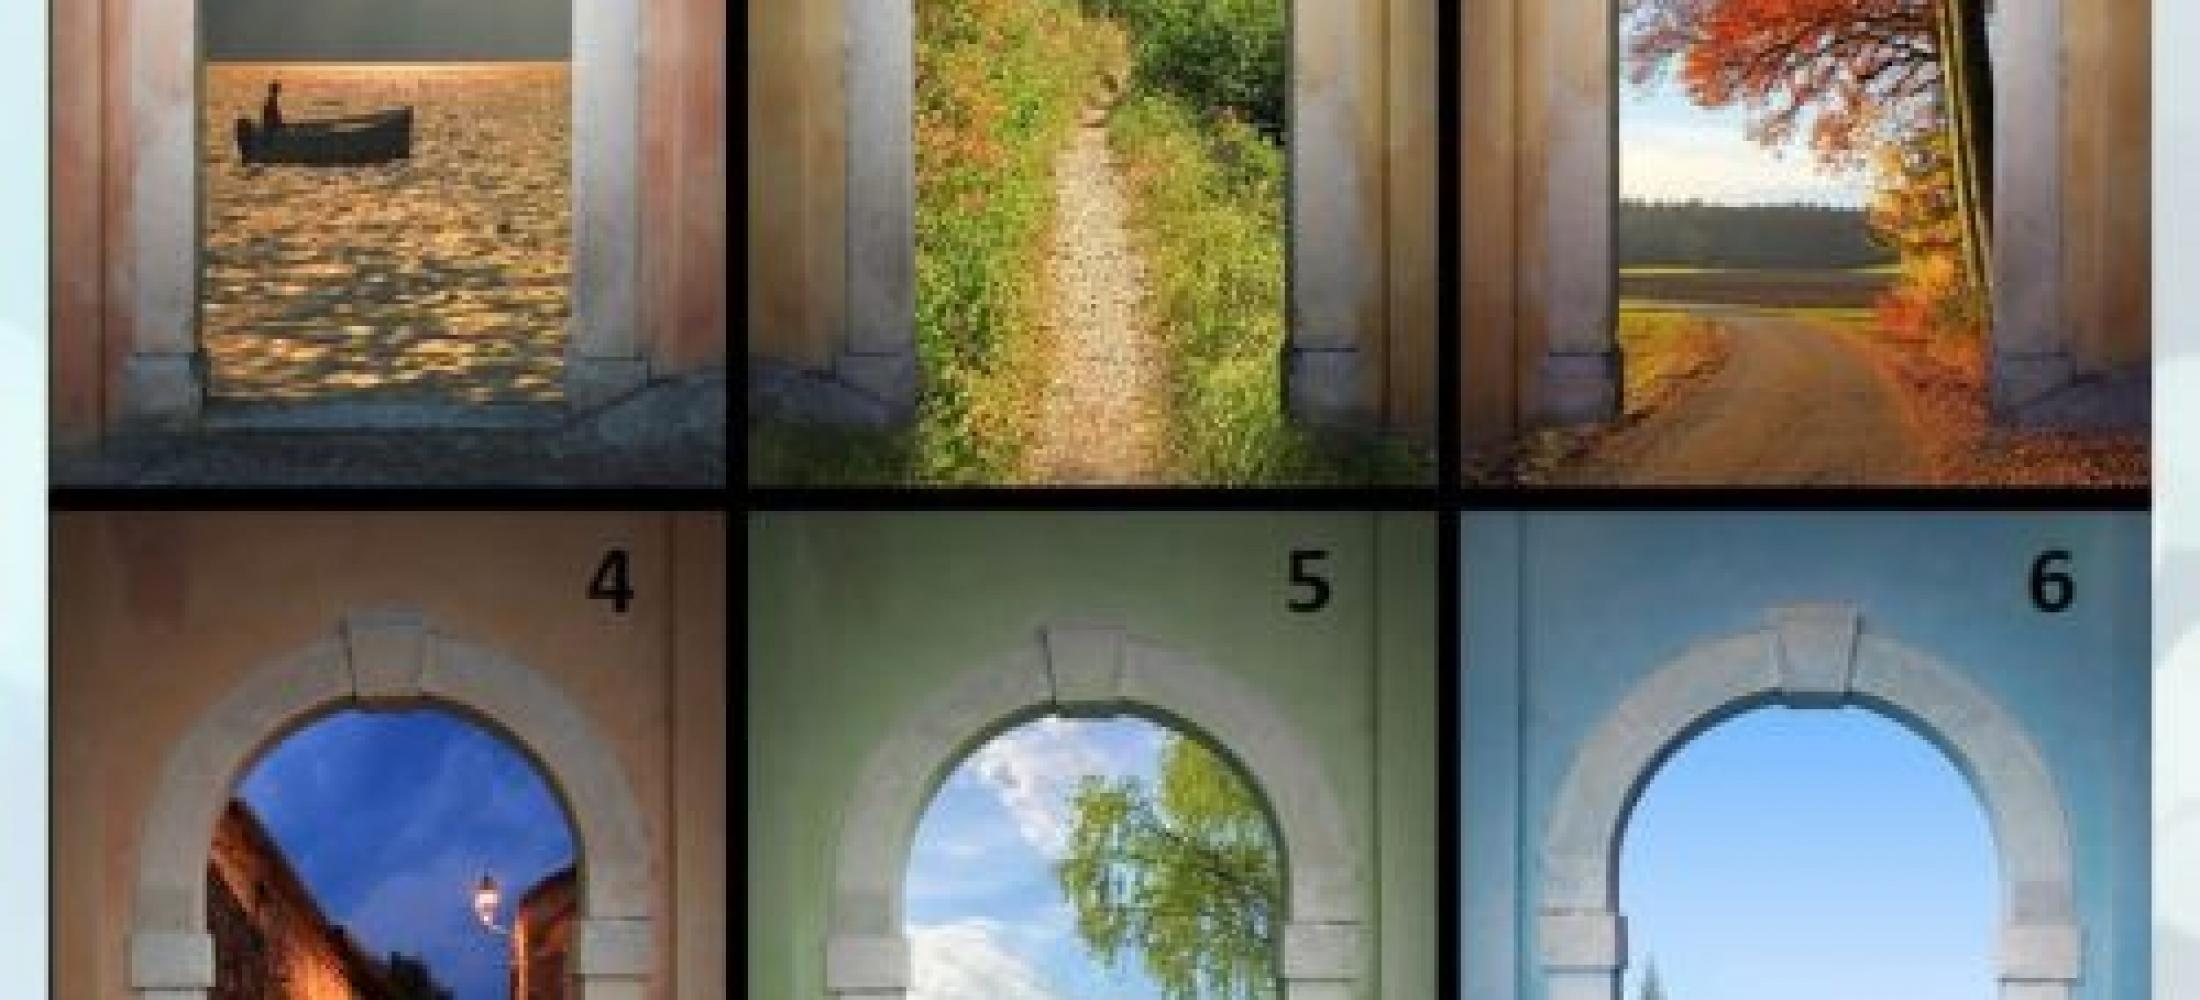 Тест «Ворота твоего пути»